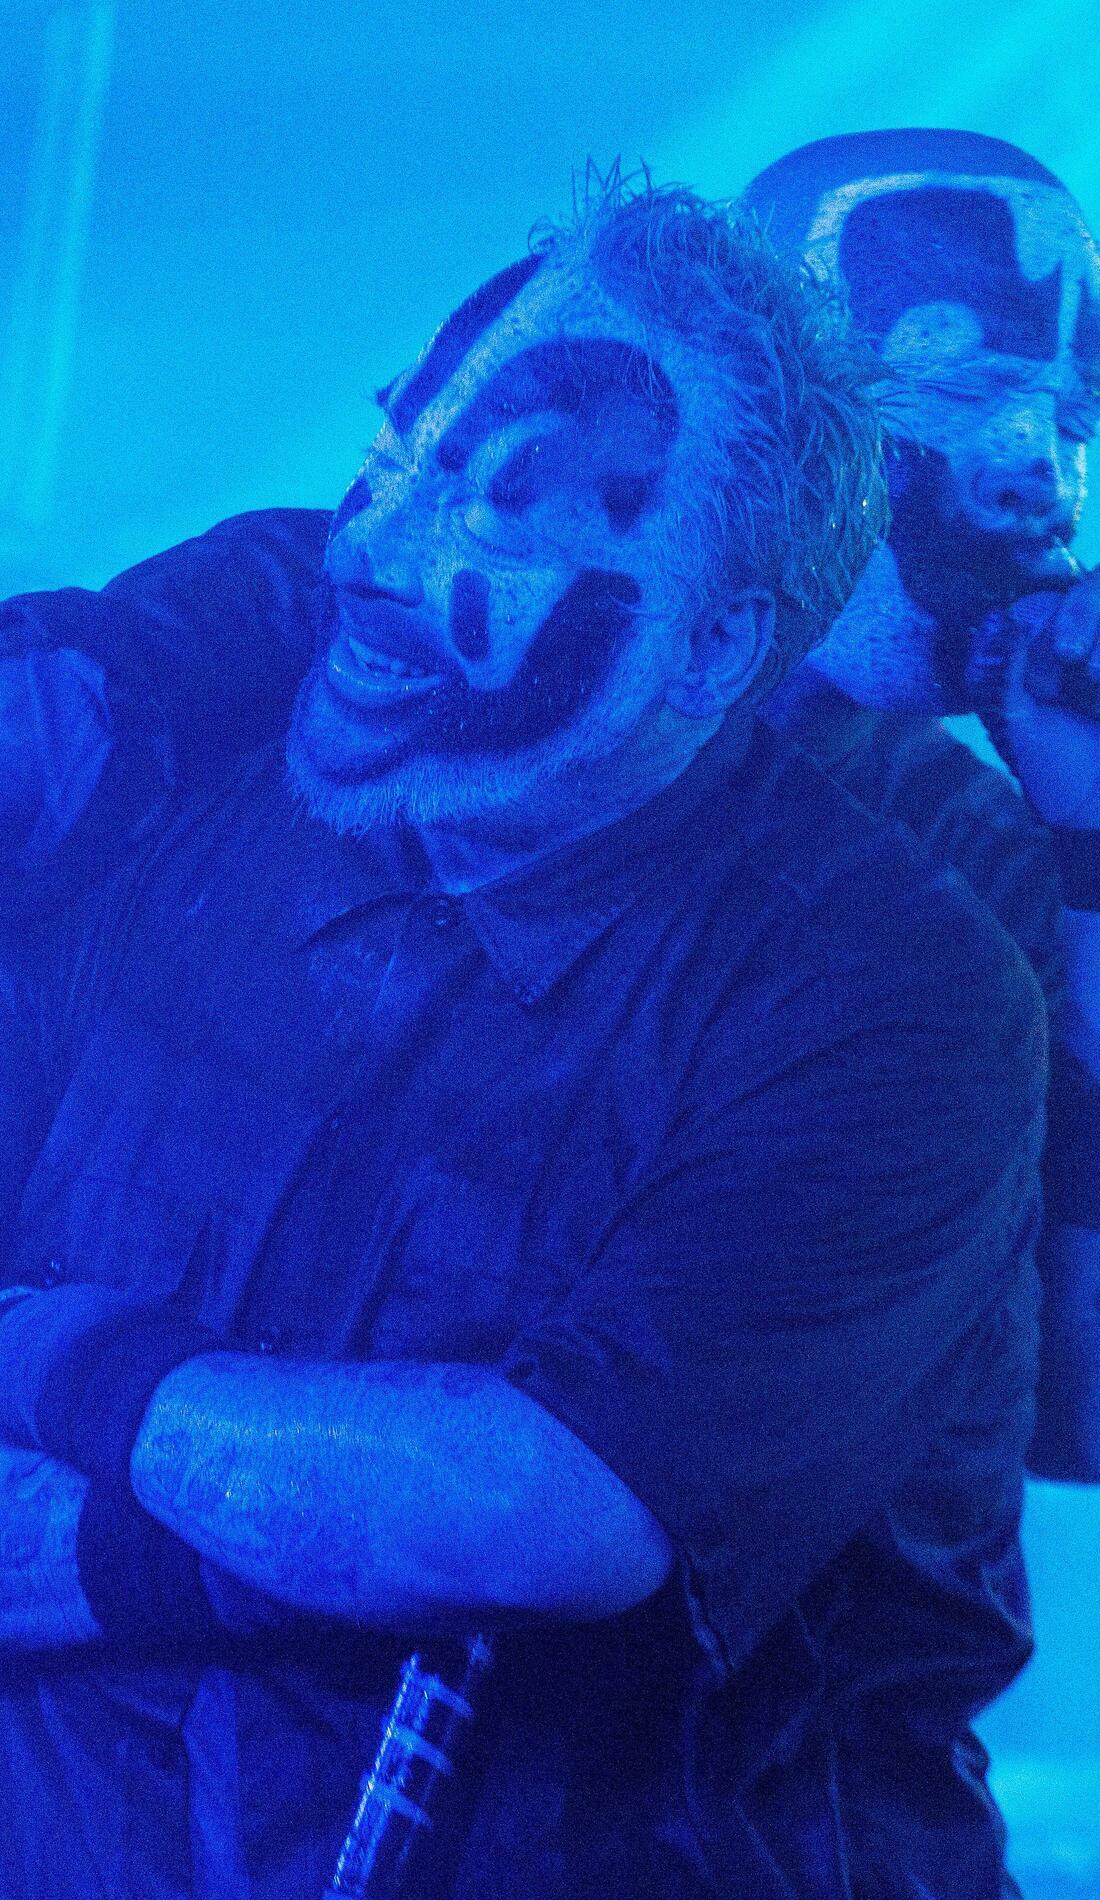 A Insane Clown Posse live event